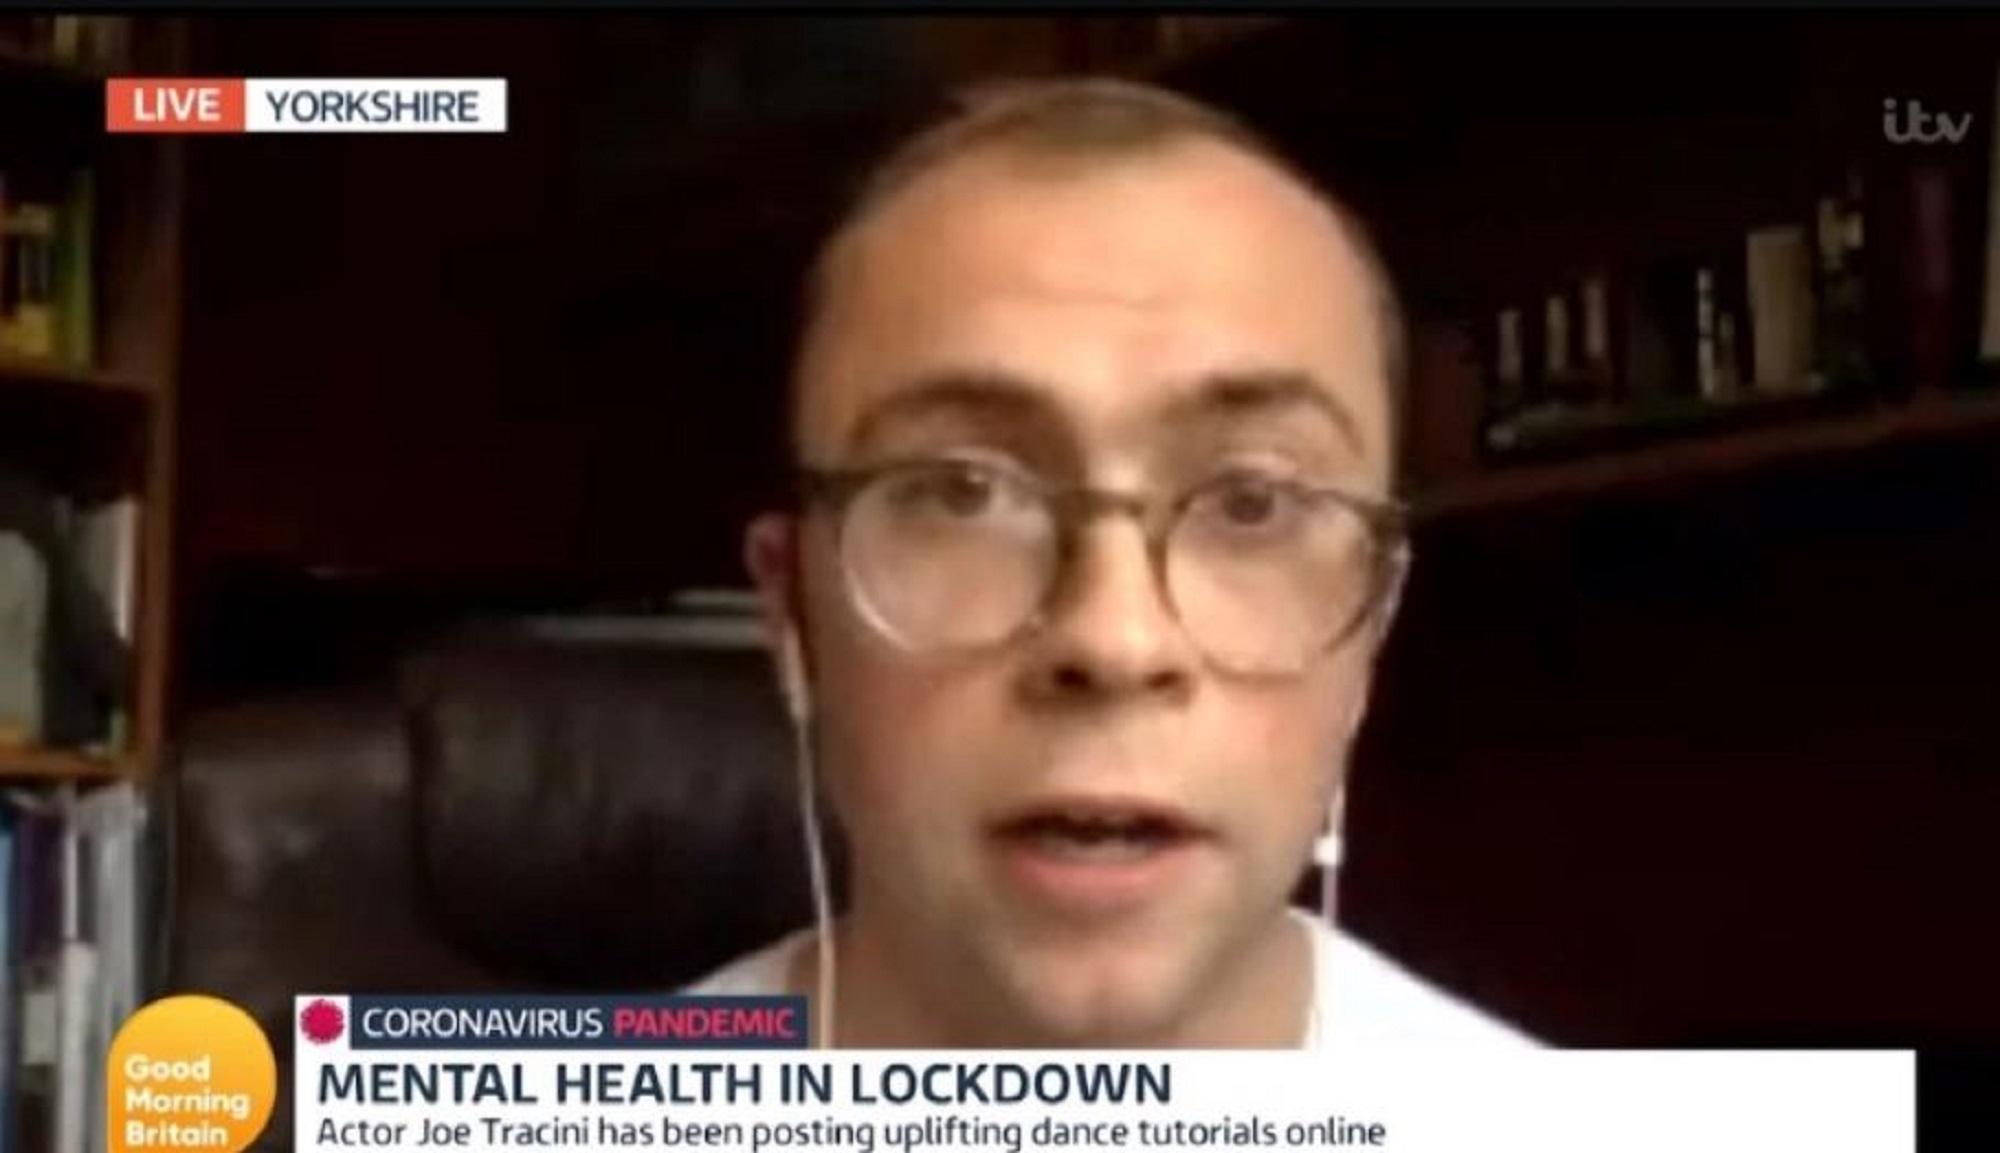 Hollyoaks star Joe Tracini 'admits he wants to kill himself on low days in lockdown'